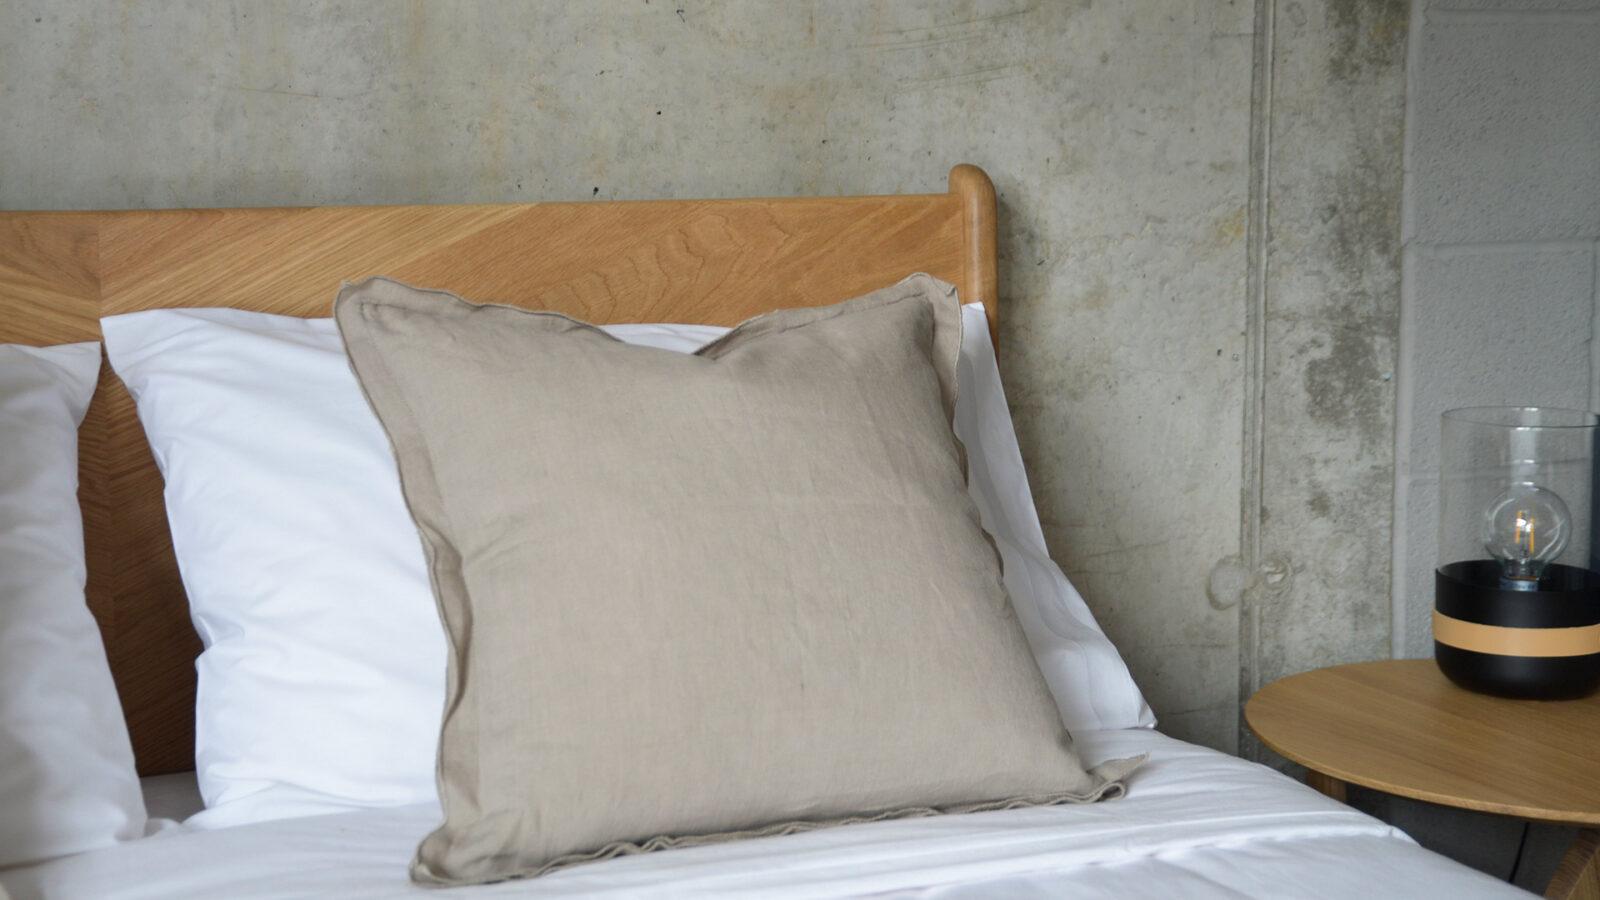 Linen ruffle edge cushion in taupe